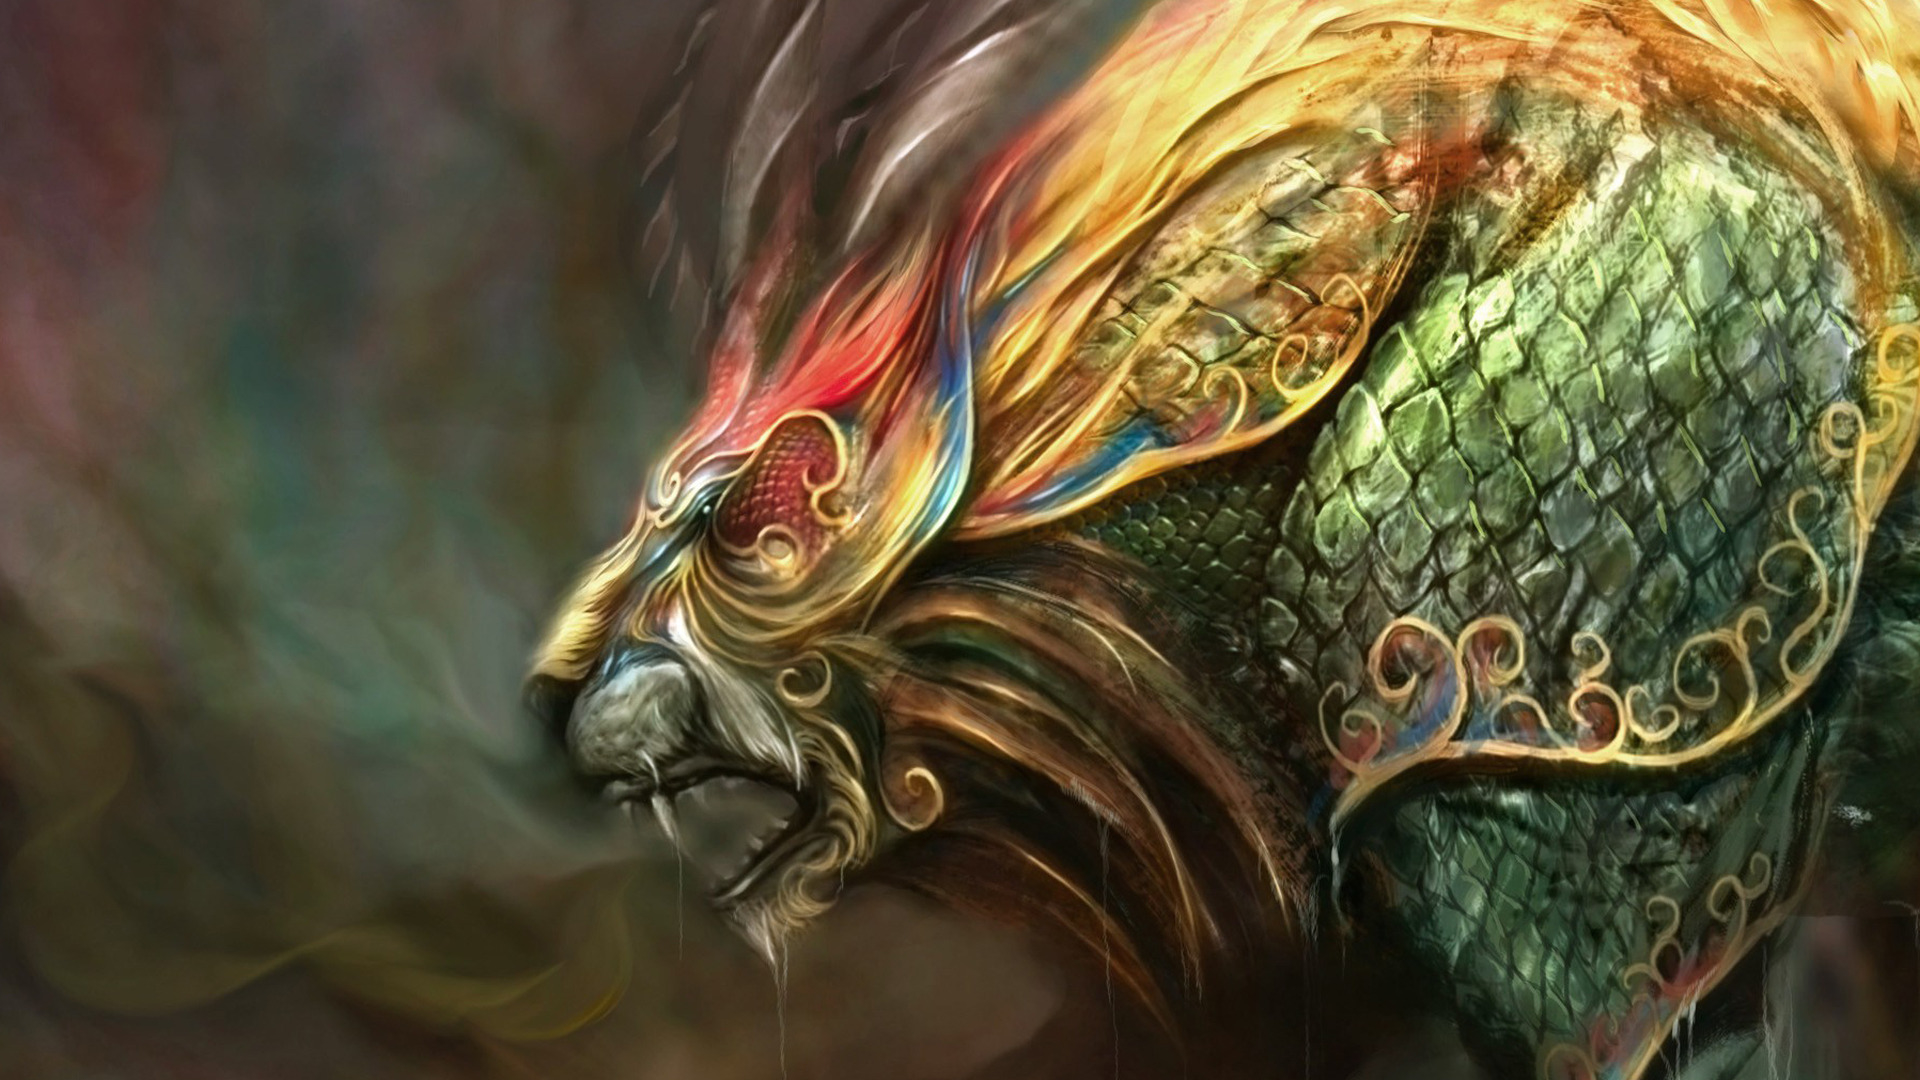 Fantasy Creature HD Wallpaper | Background Image